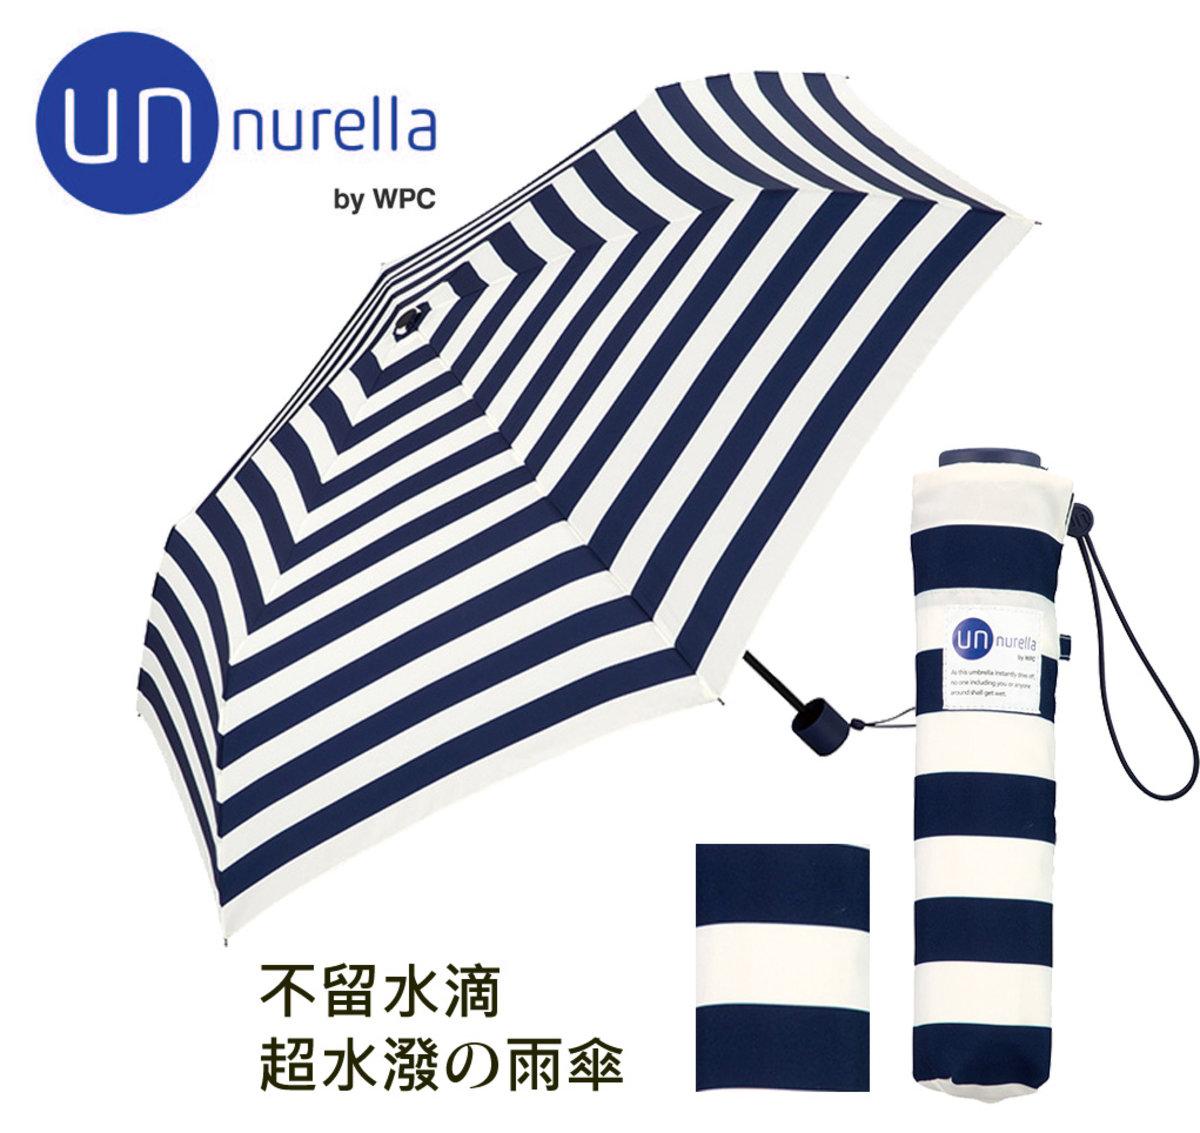 Clear all rain drop in a second ‧ Umbrella specialist from Japan - Unnurella by WPC UN-106-B/NV Folding Umbrella